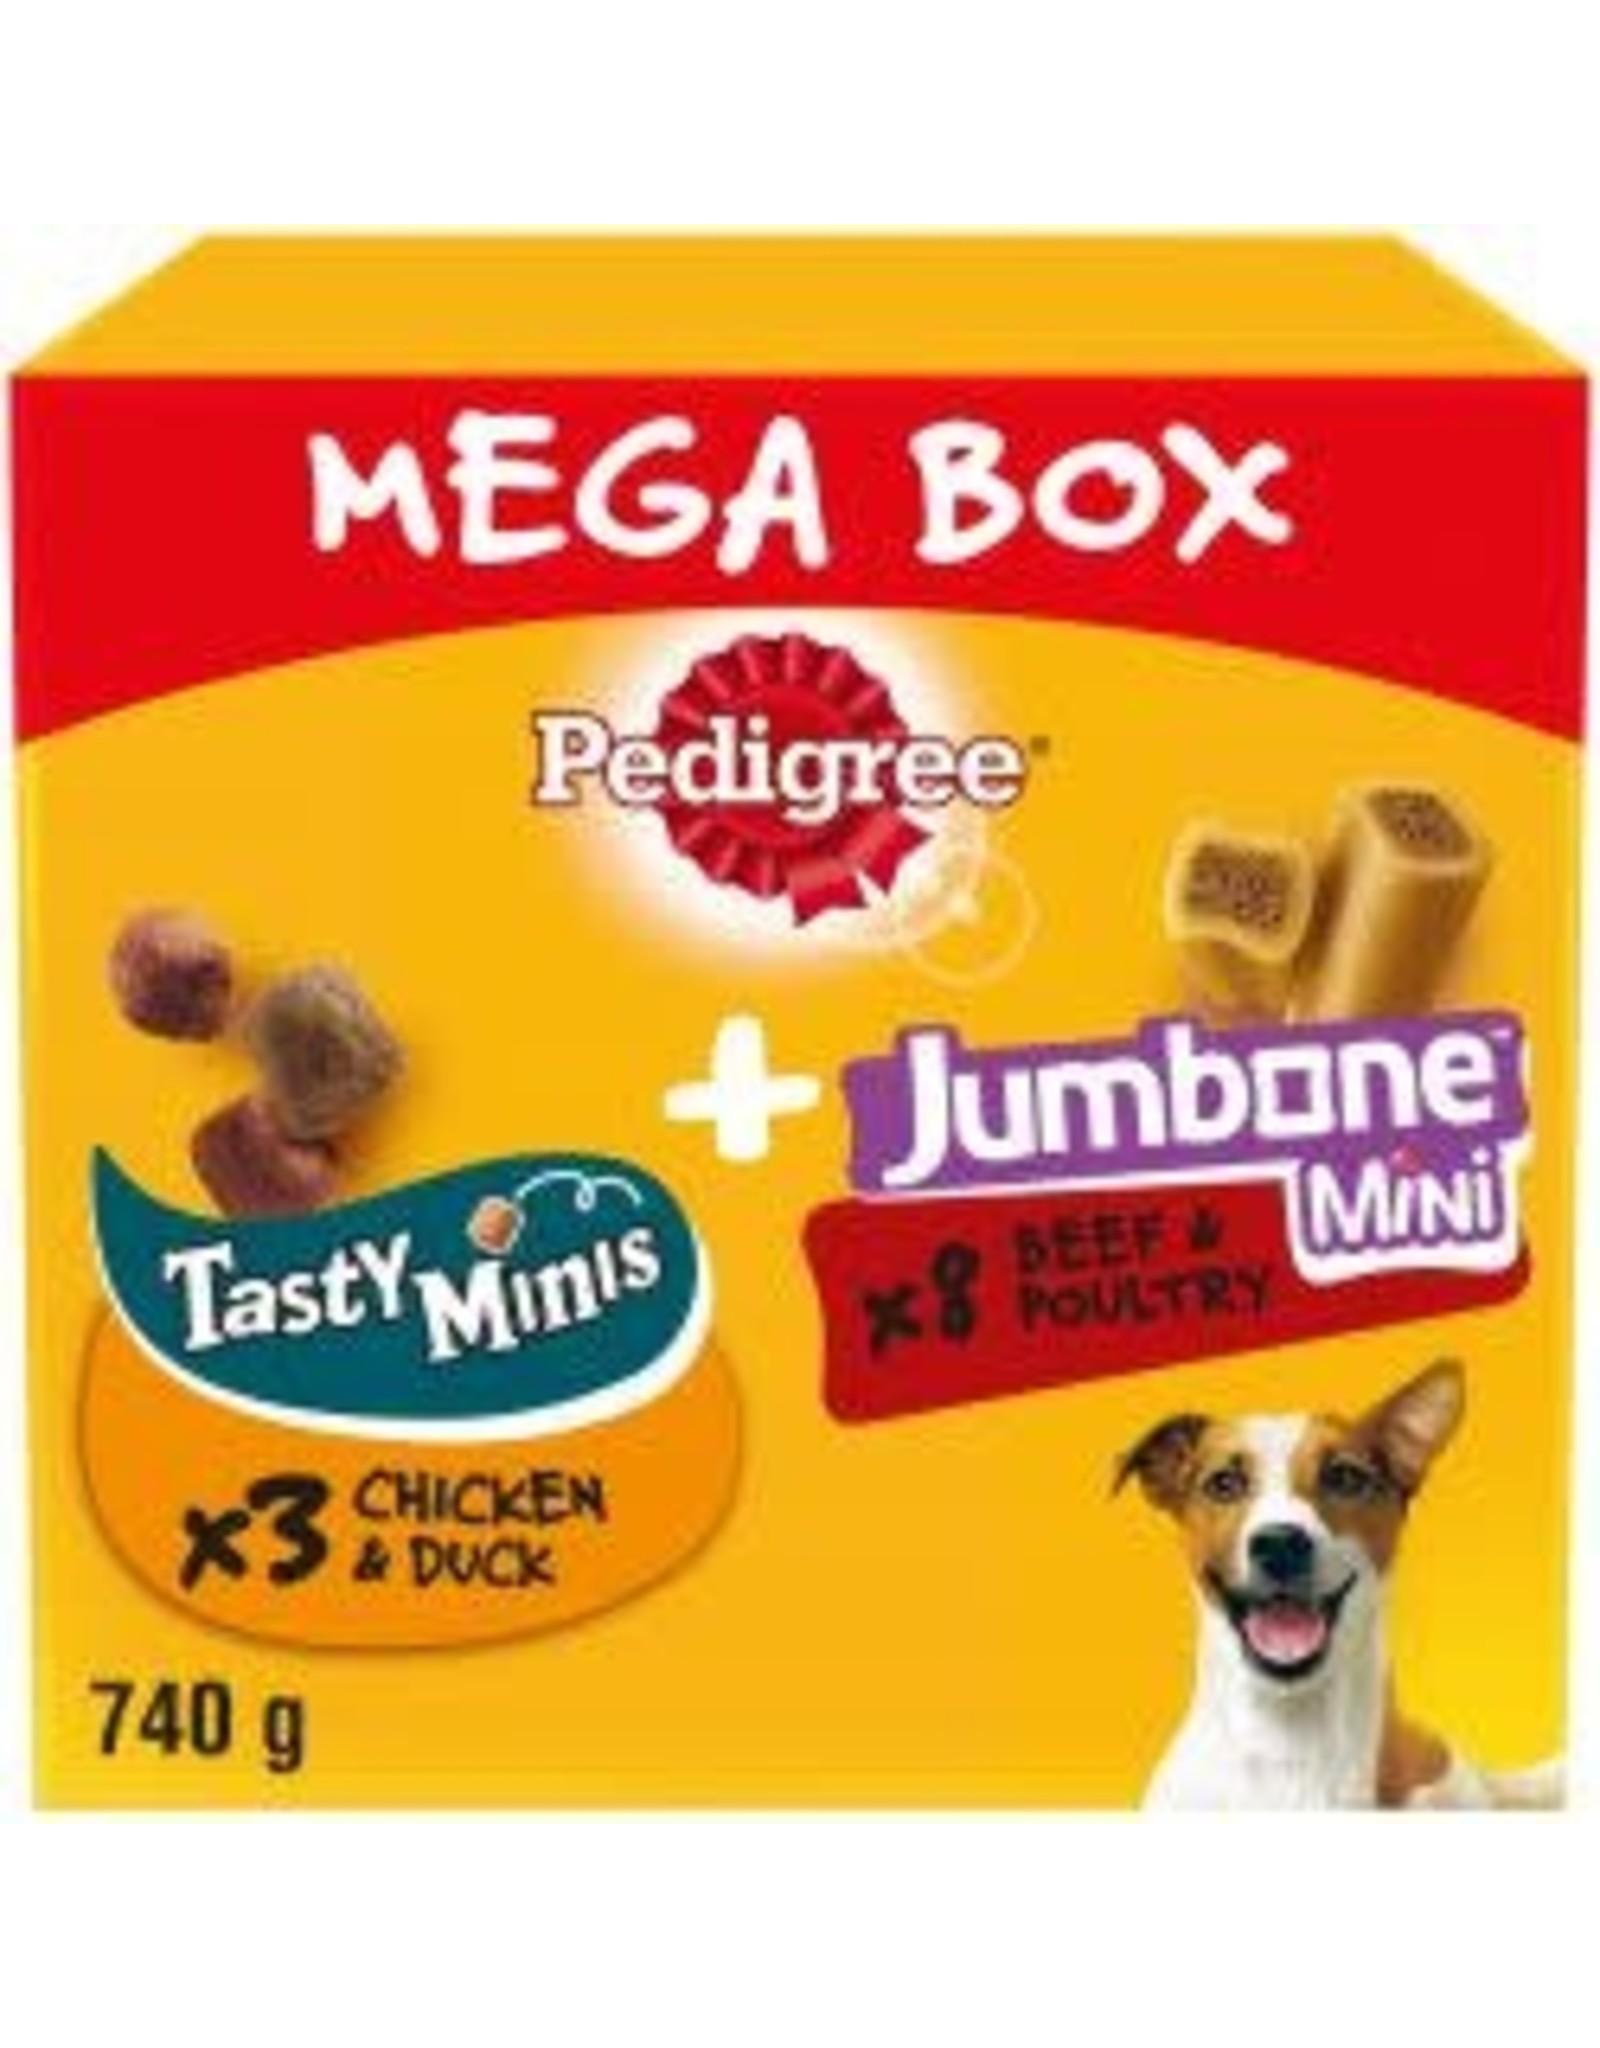 Pedigree Pedigree Tasty Minis & Jumbone Small Mega Box